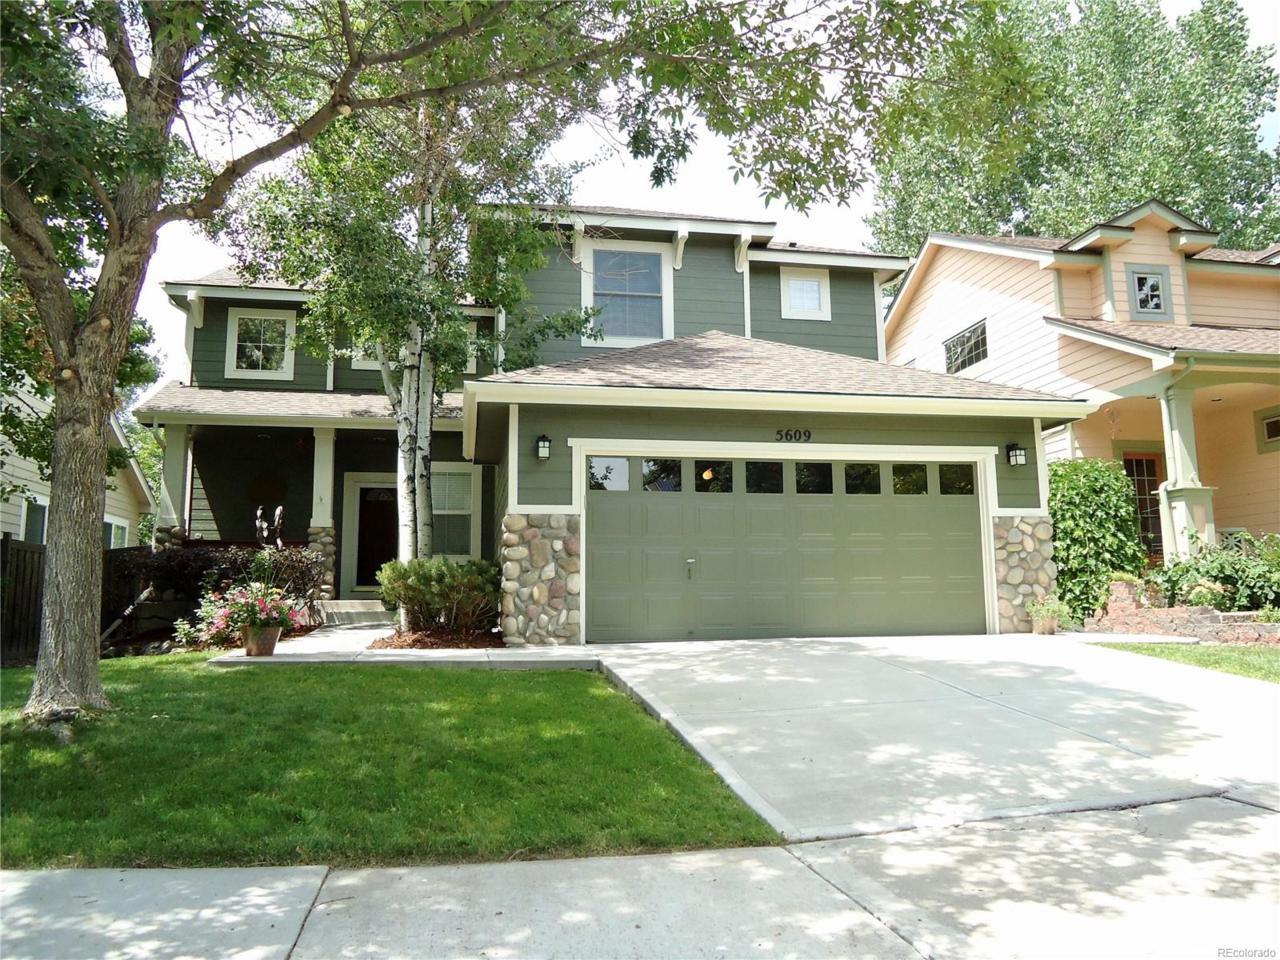 5609 S Harlan Street, Littleton, CO 80123 (MLS #8009523) :: 8z Real Estate